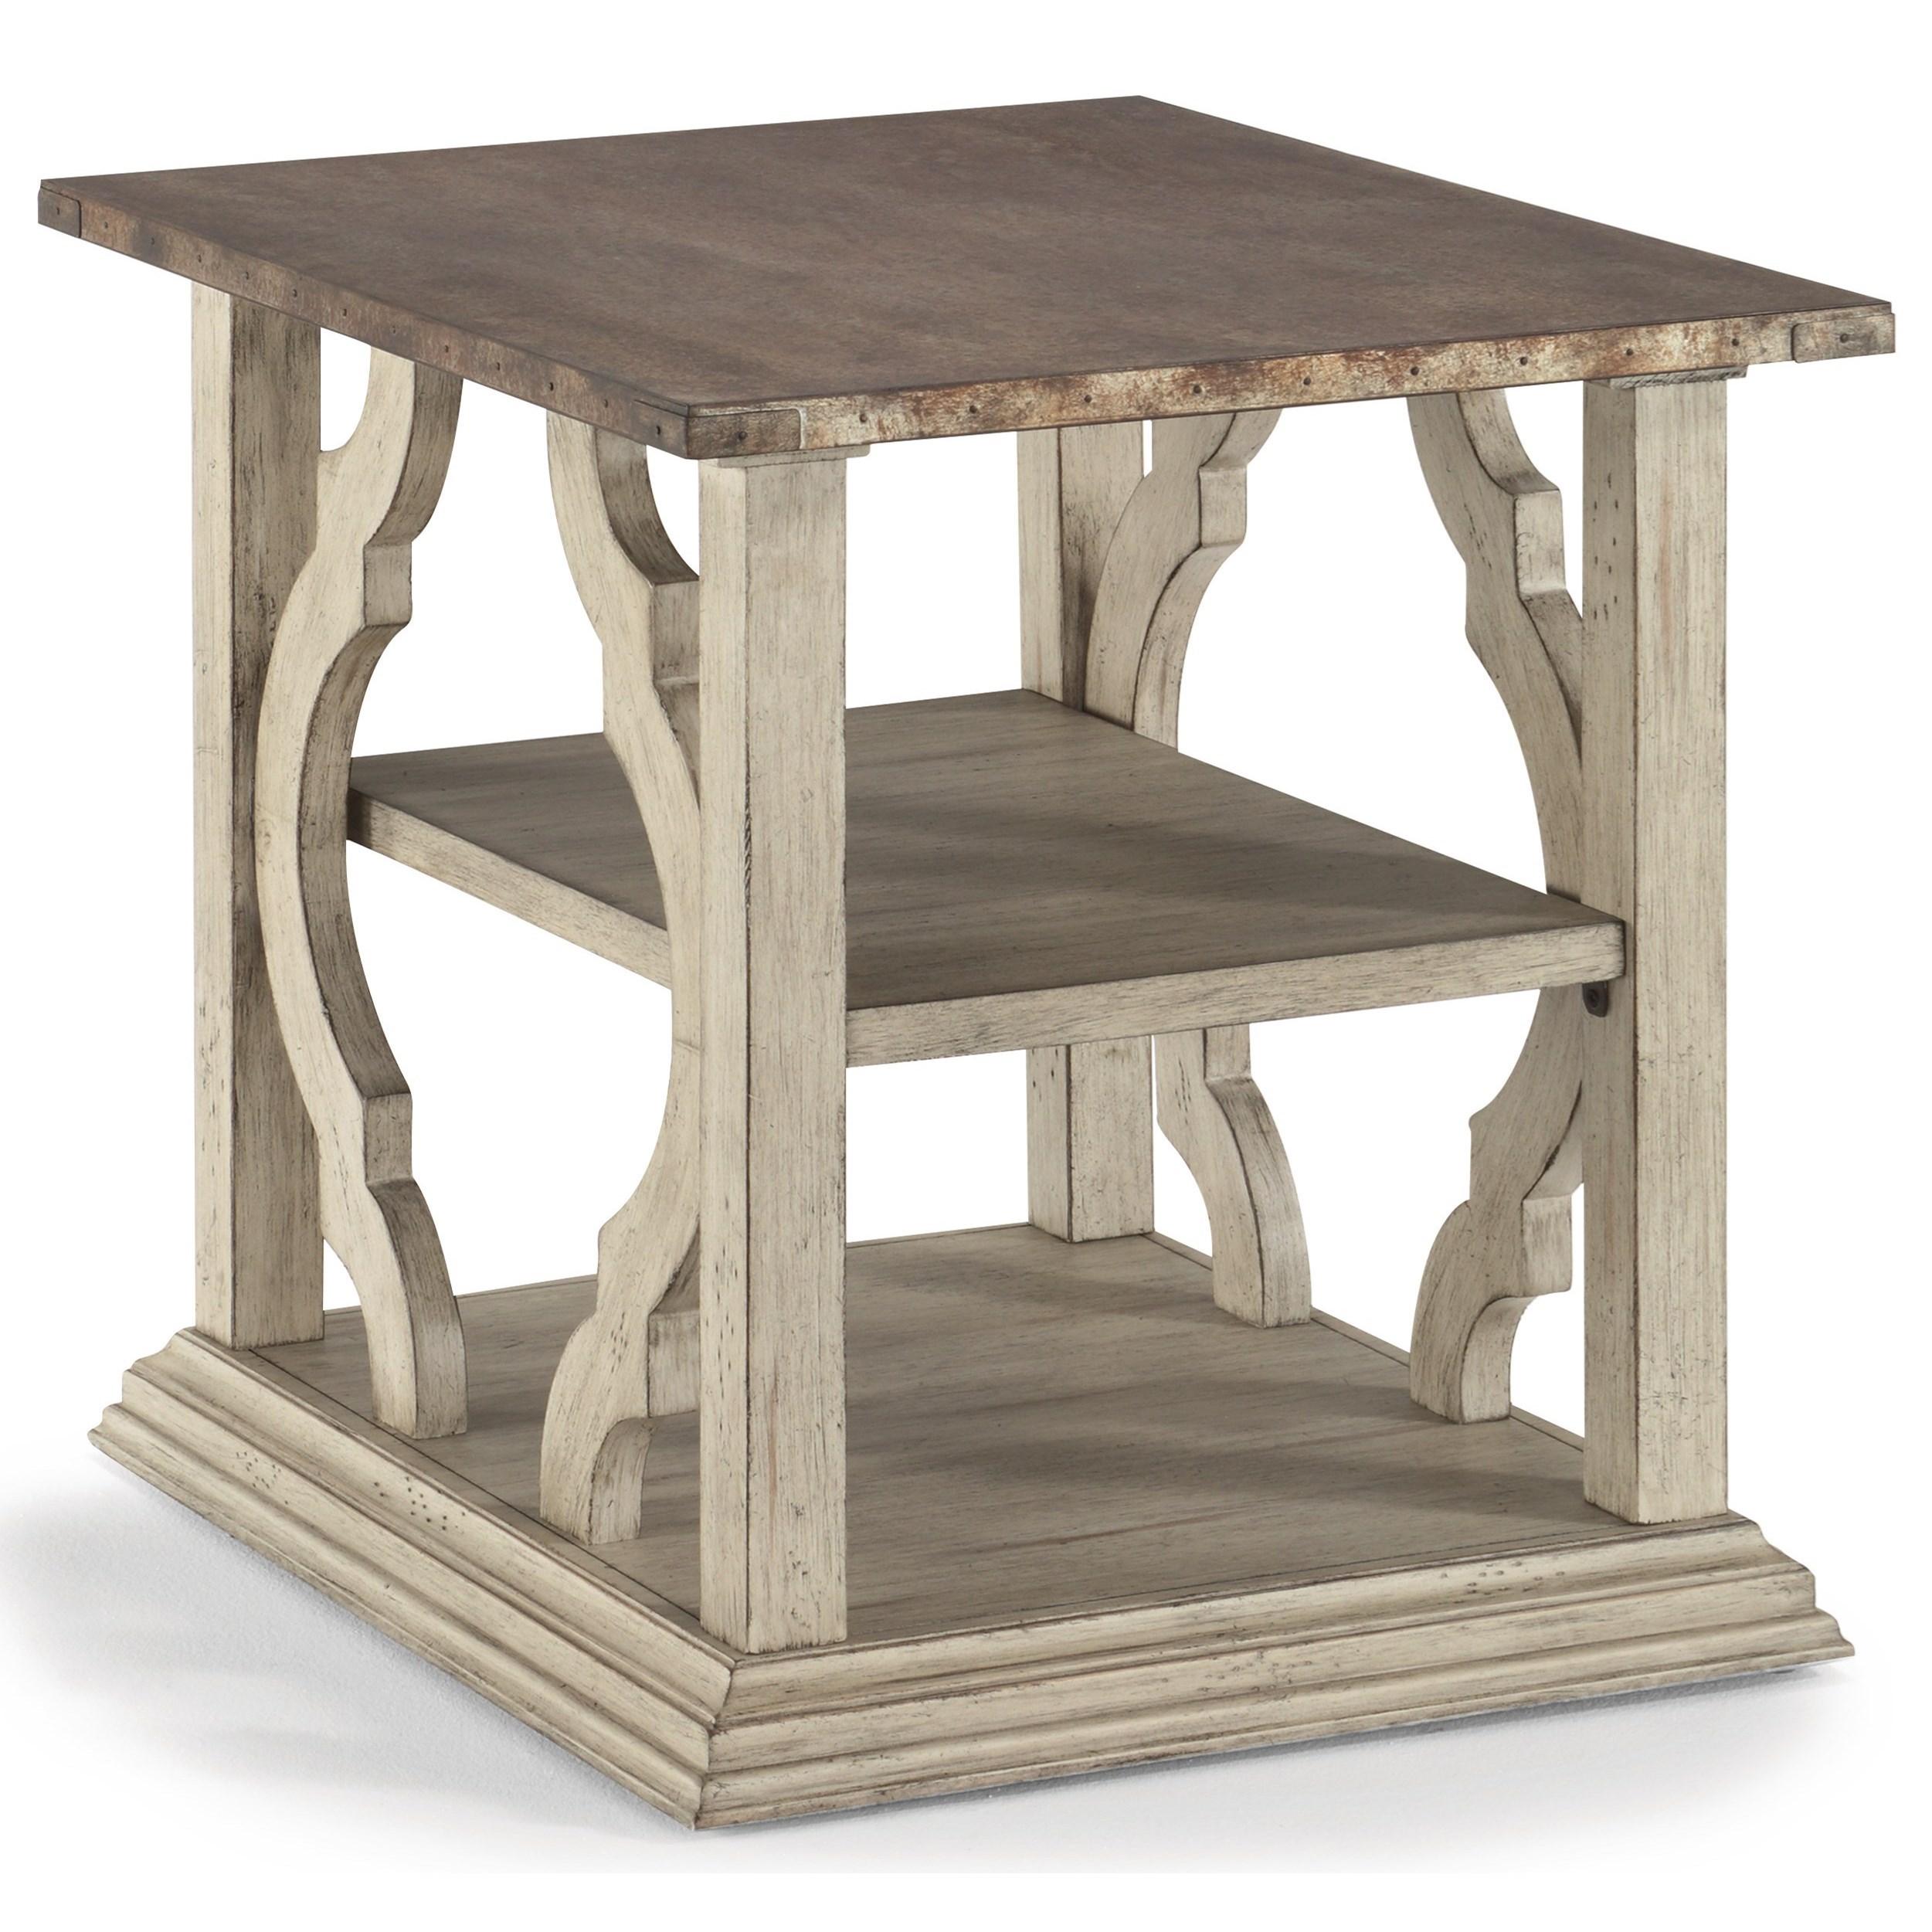 Estate End Table by Flexsteel Wynwood Collection at Steger's Furniture